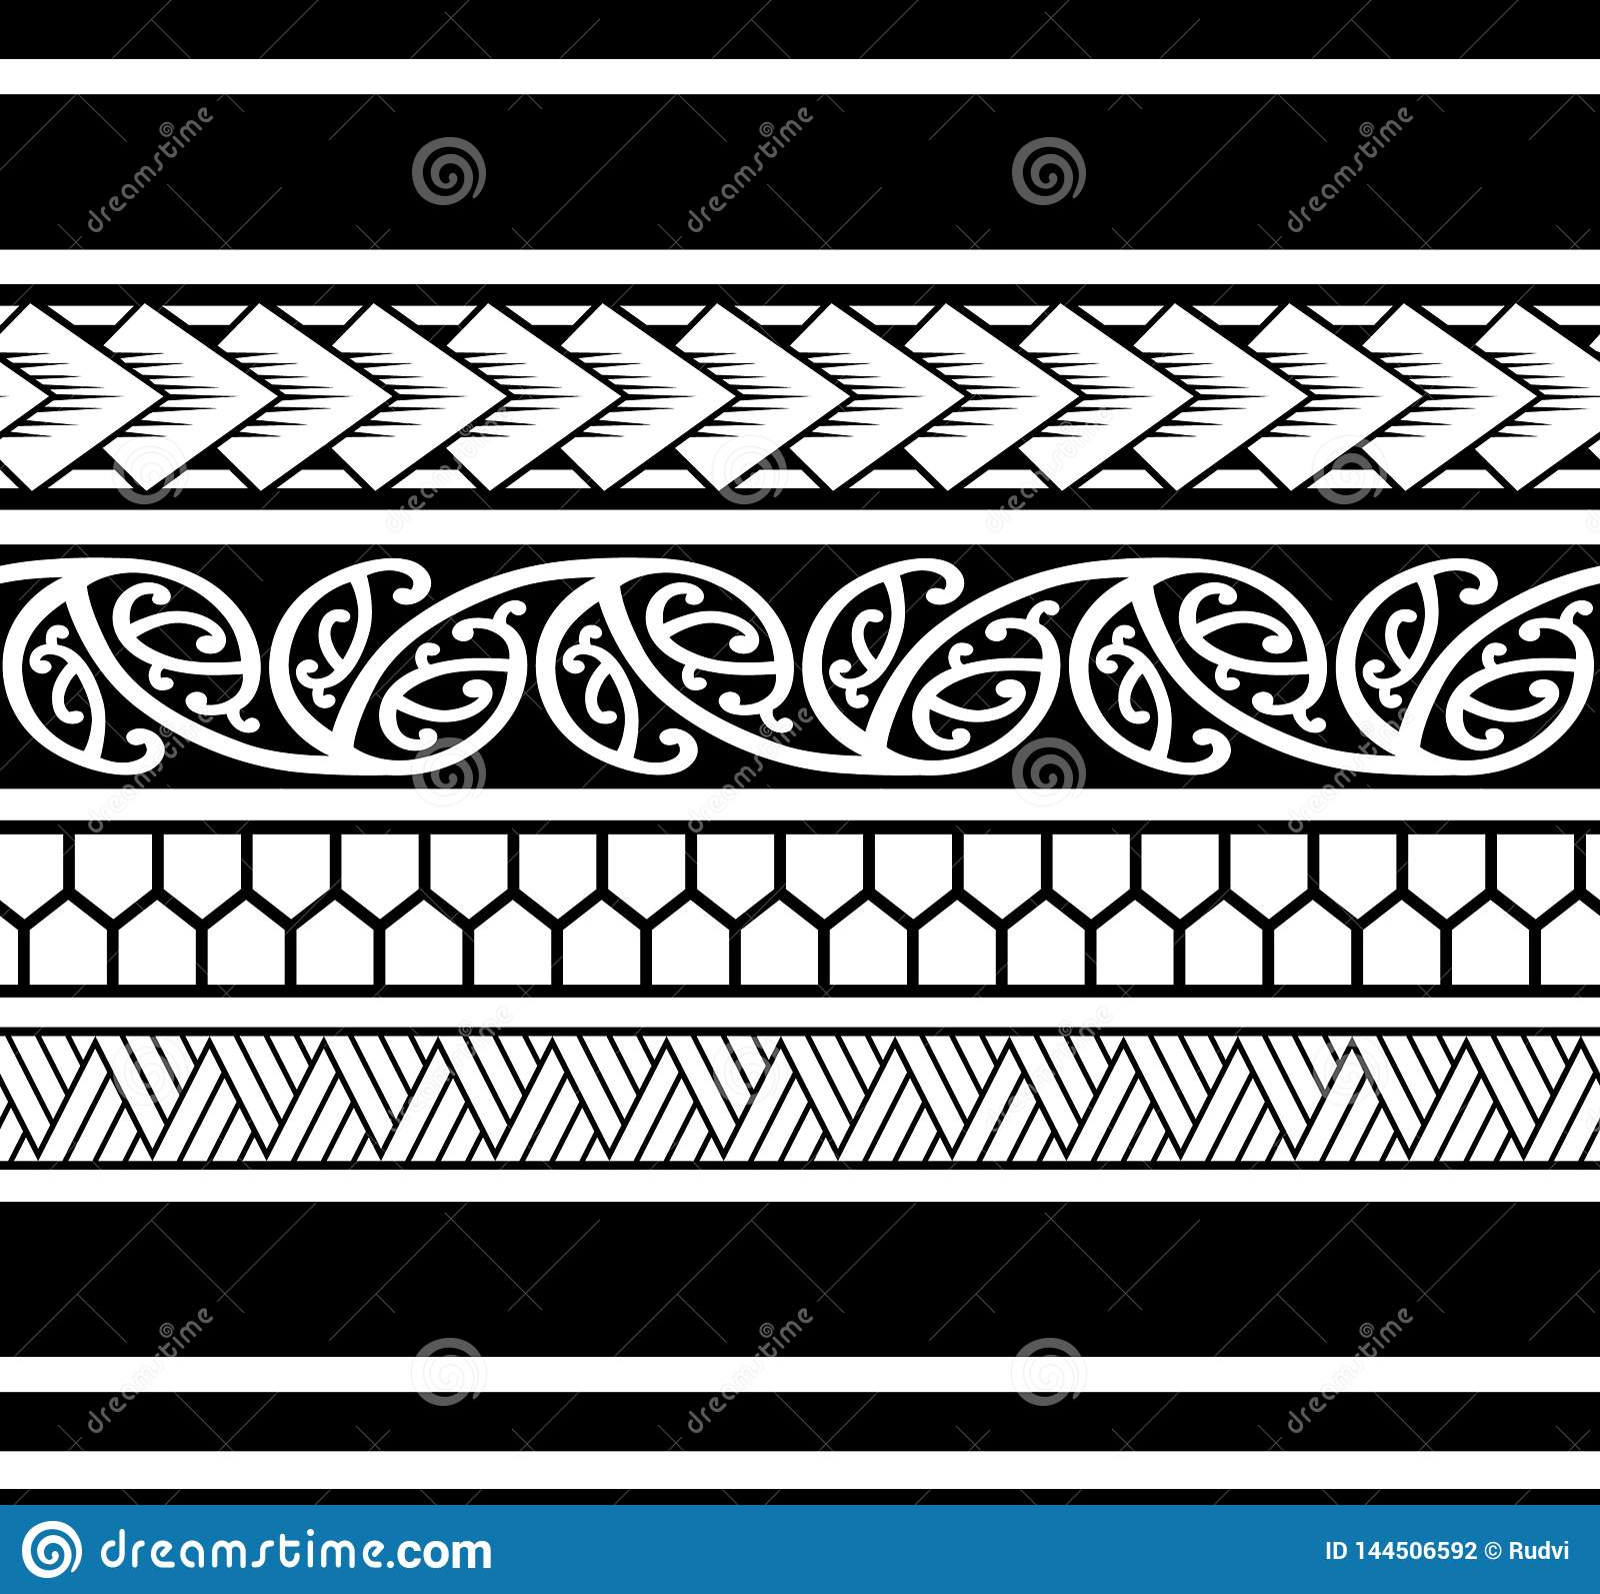 Polynesian Tattoo Sleeve Pattern Samoan Sketch Forearm And Foot